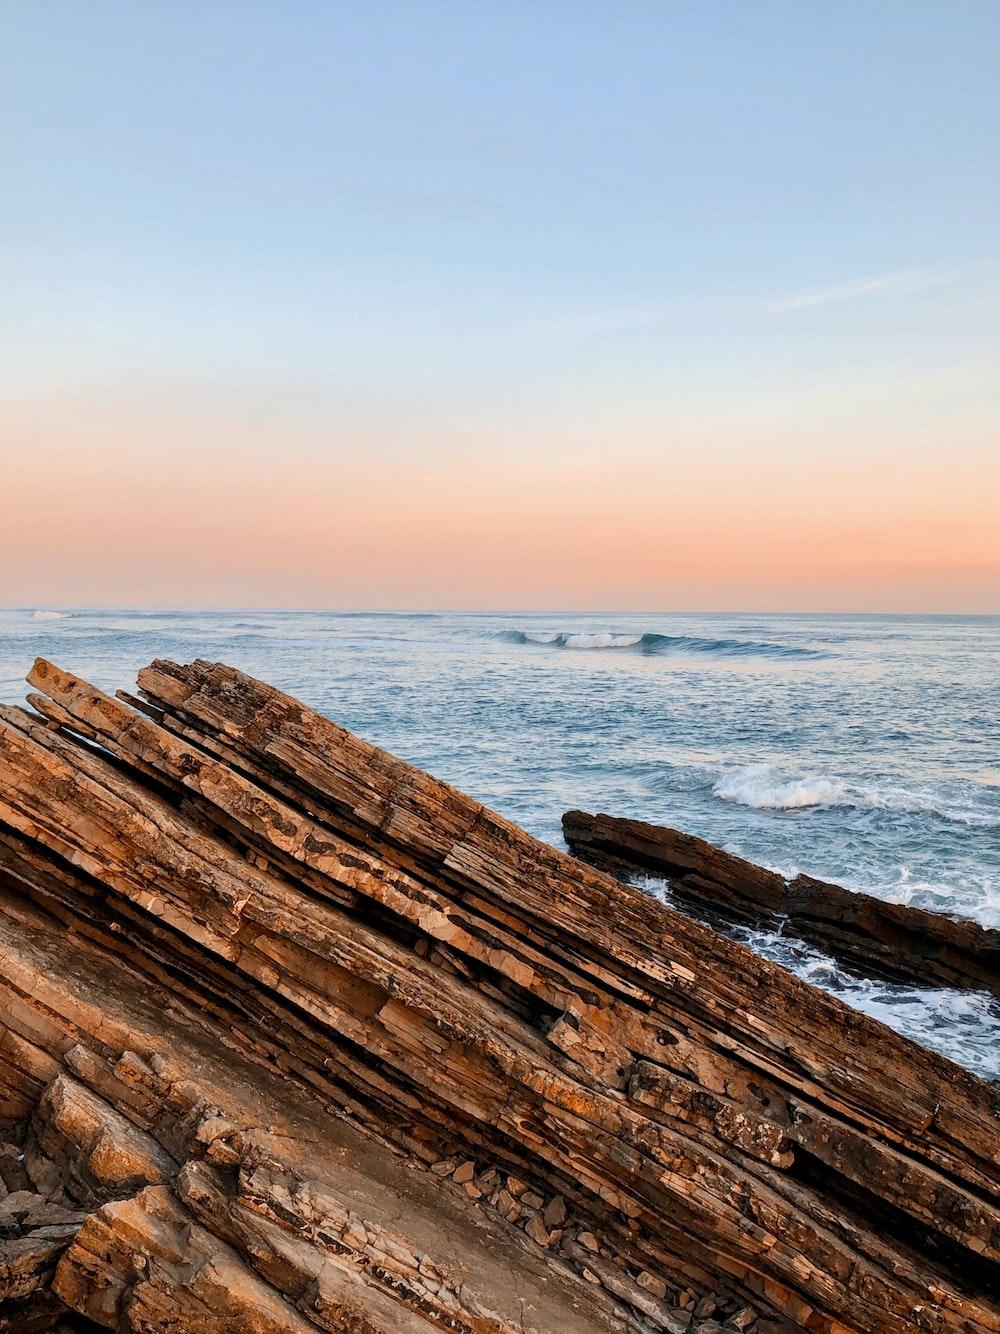 brown wood log on beach during daytime